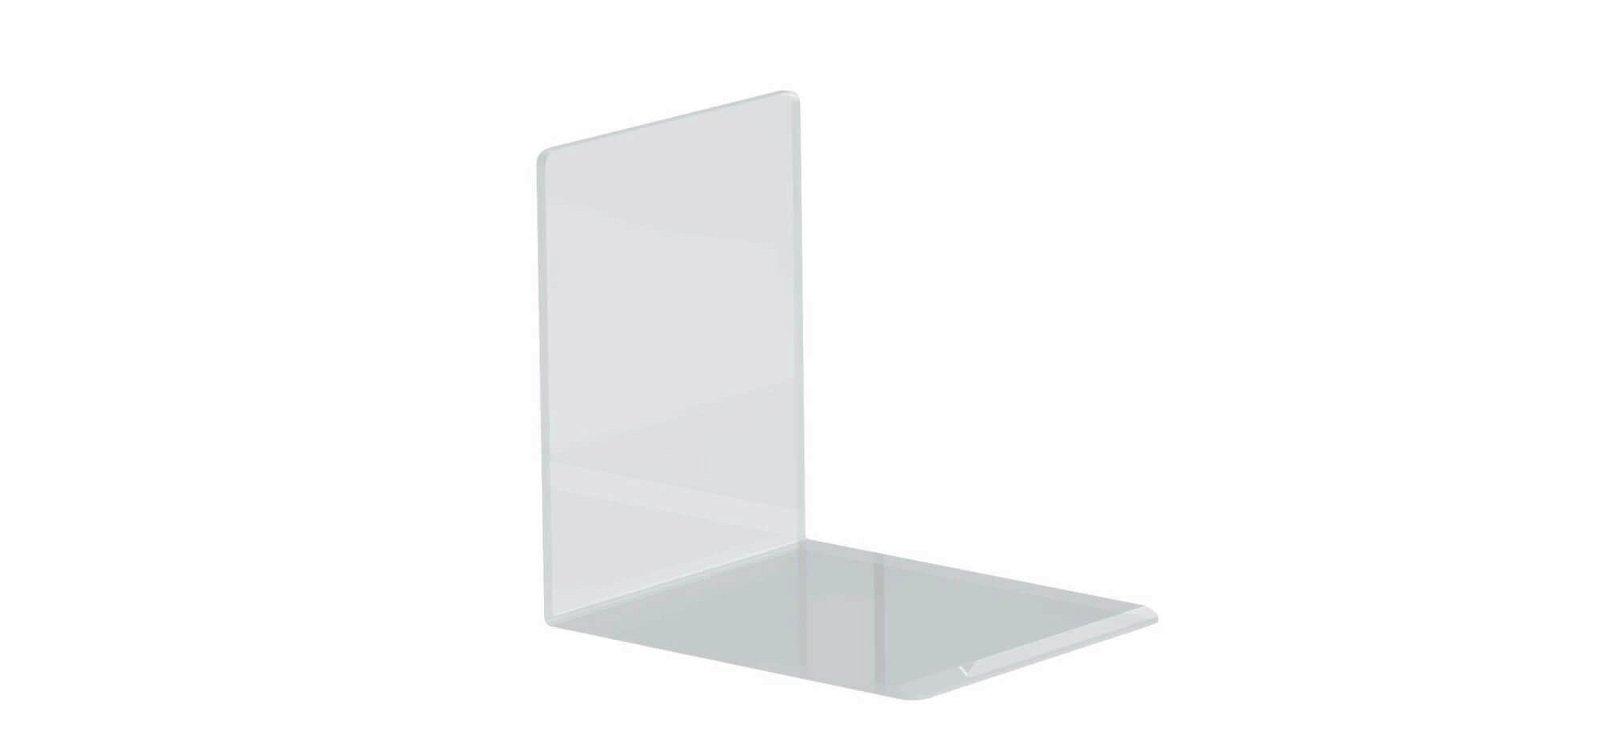 Buchstützen aus Acryl, 10 x 8 x 10 cm, glasklar